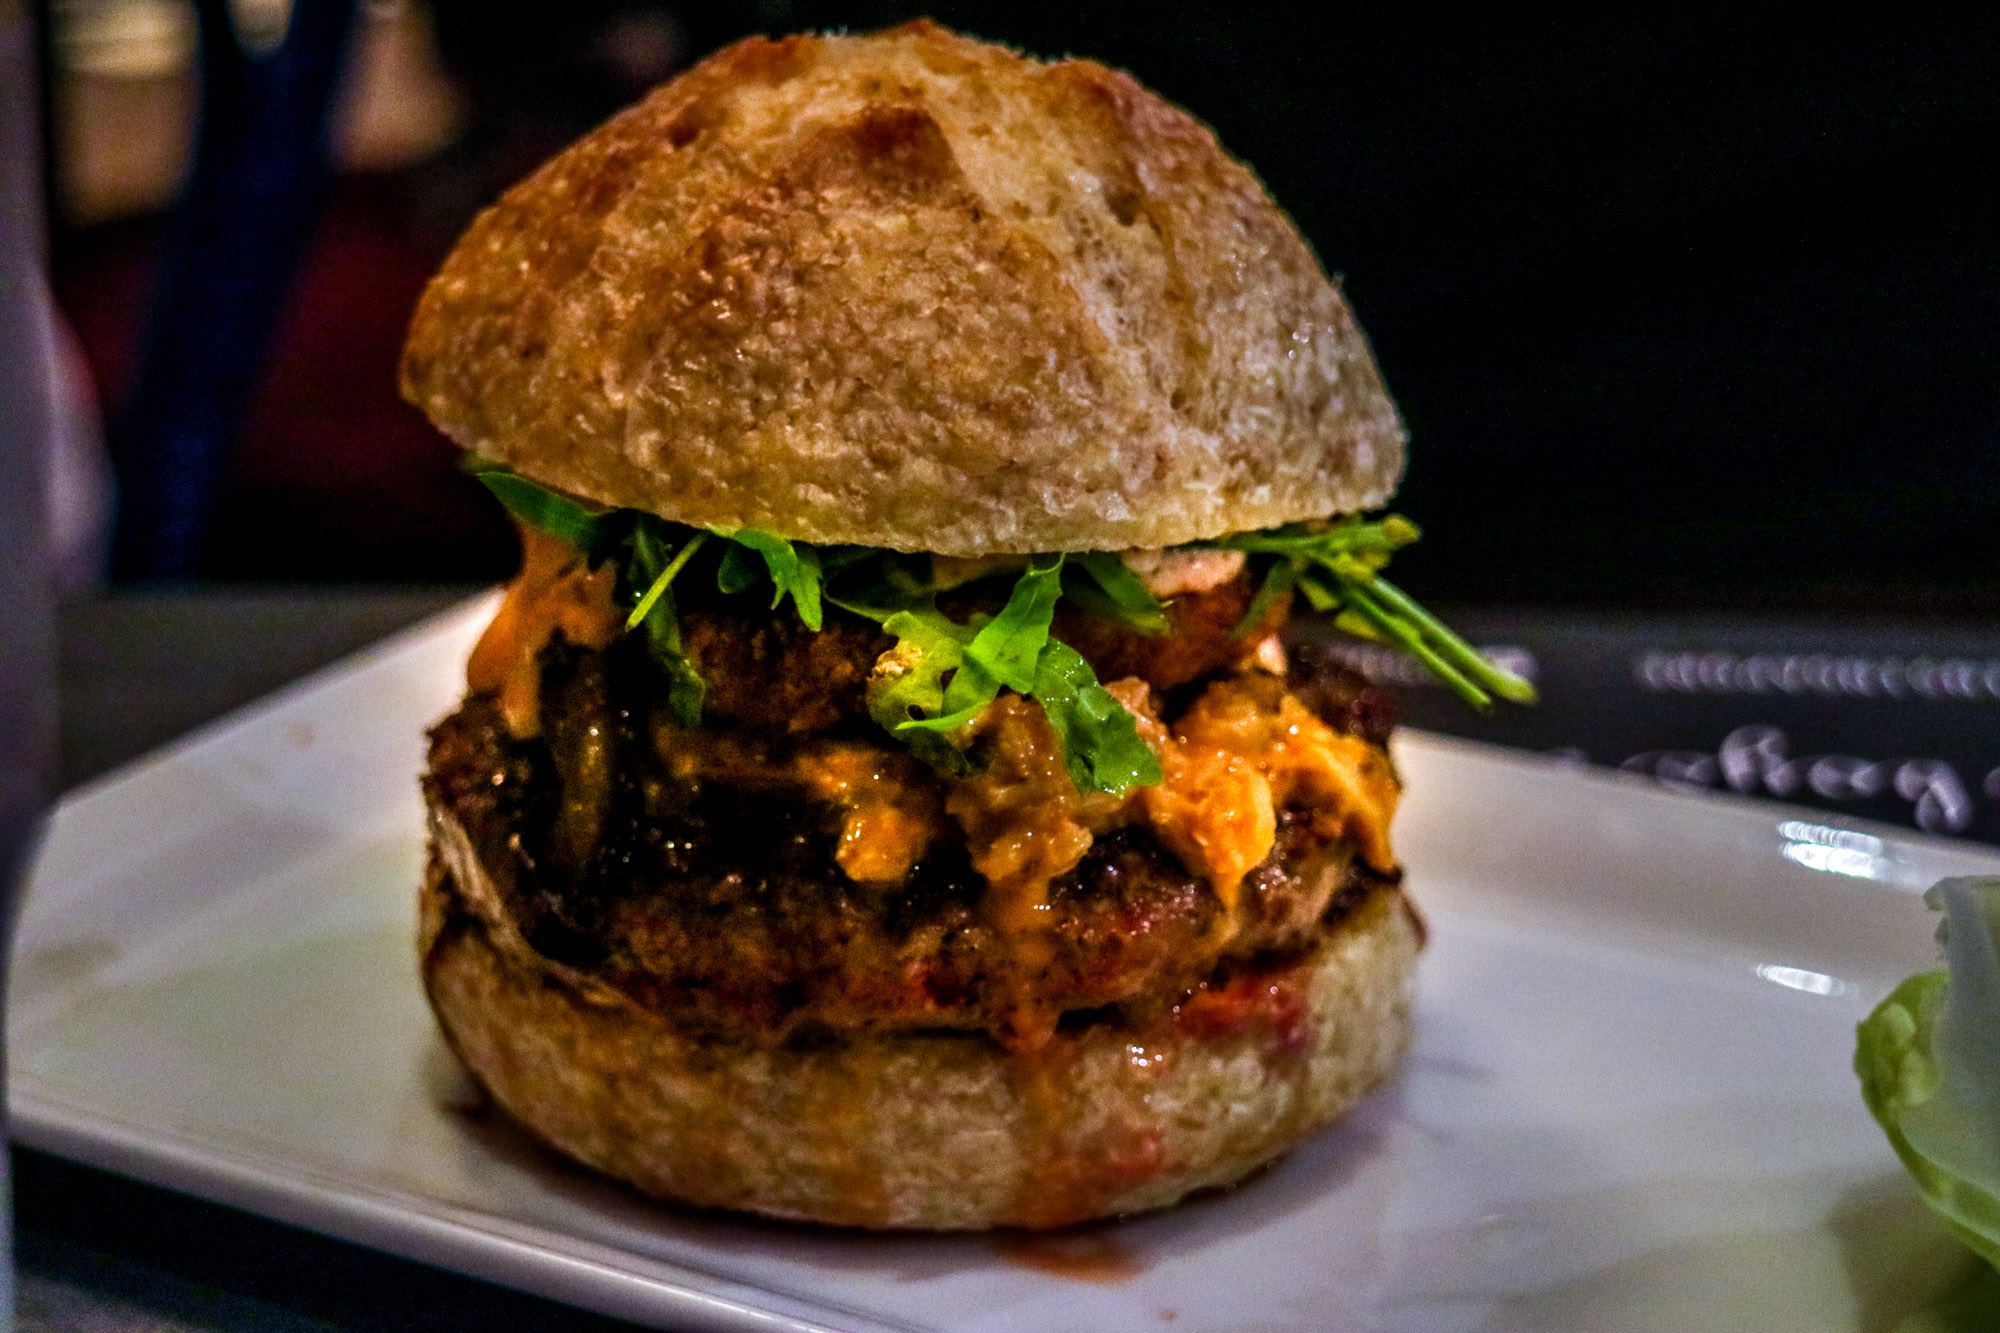 25 Degrees Burger and Liquor Bar - Bae Watch Burger & Peroni Set